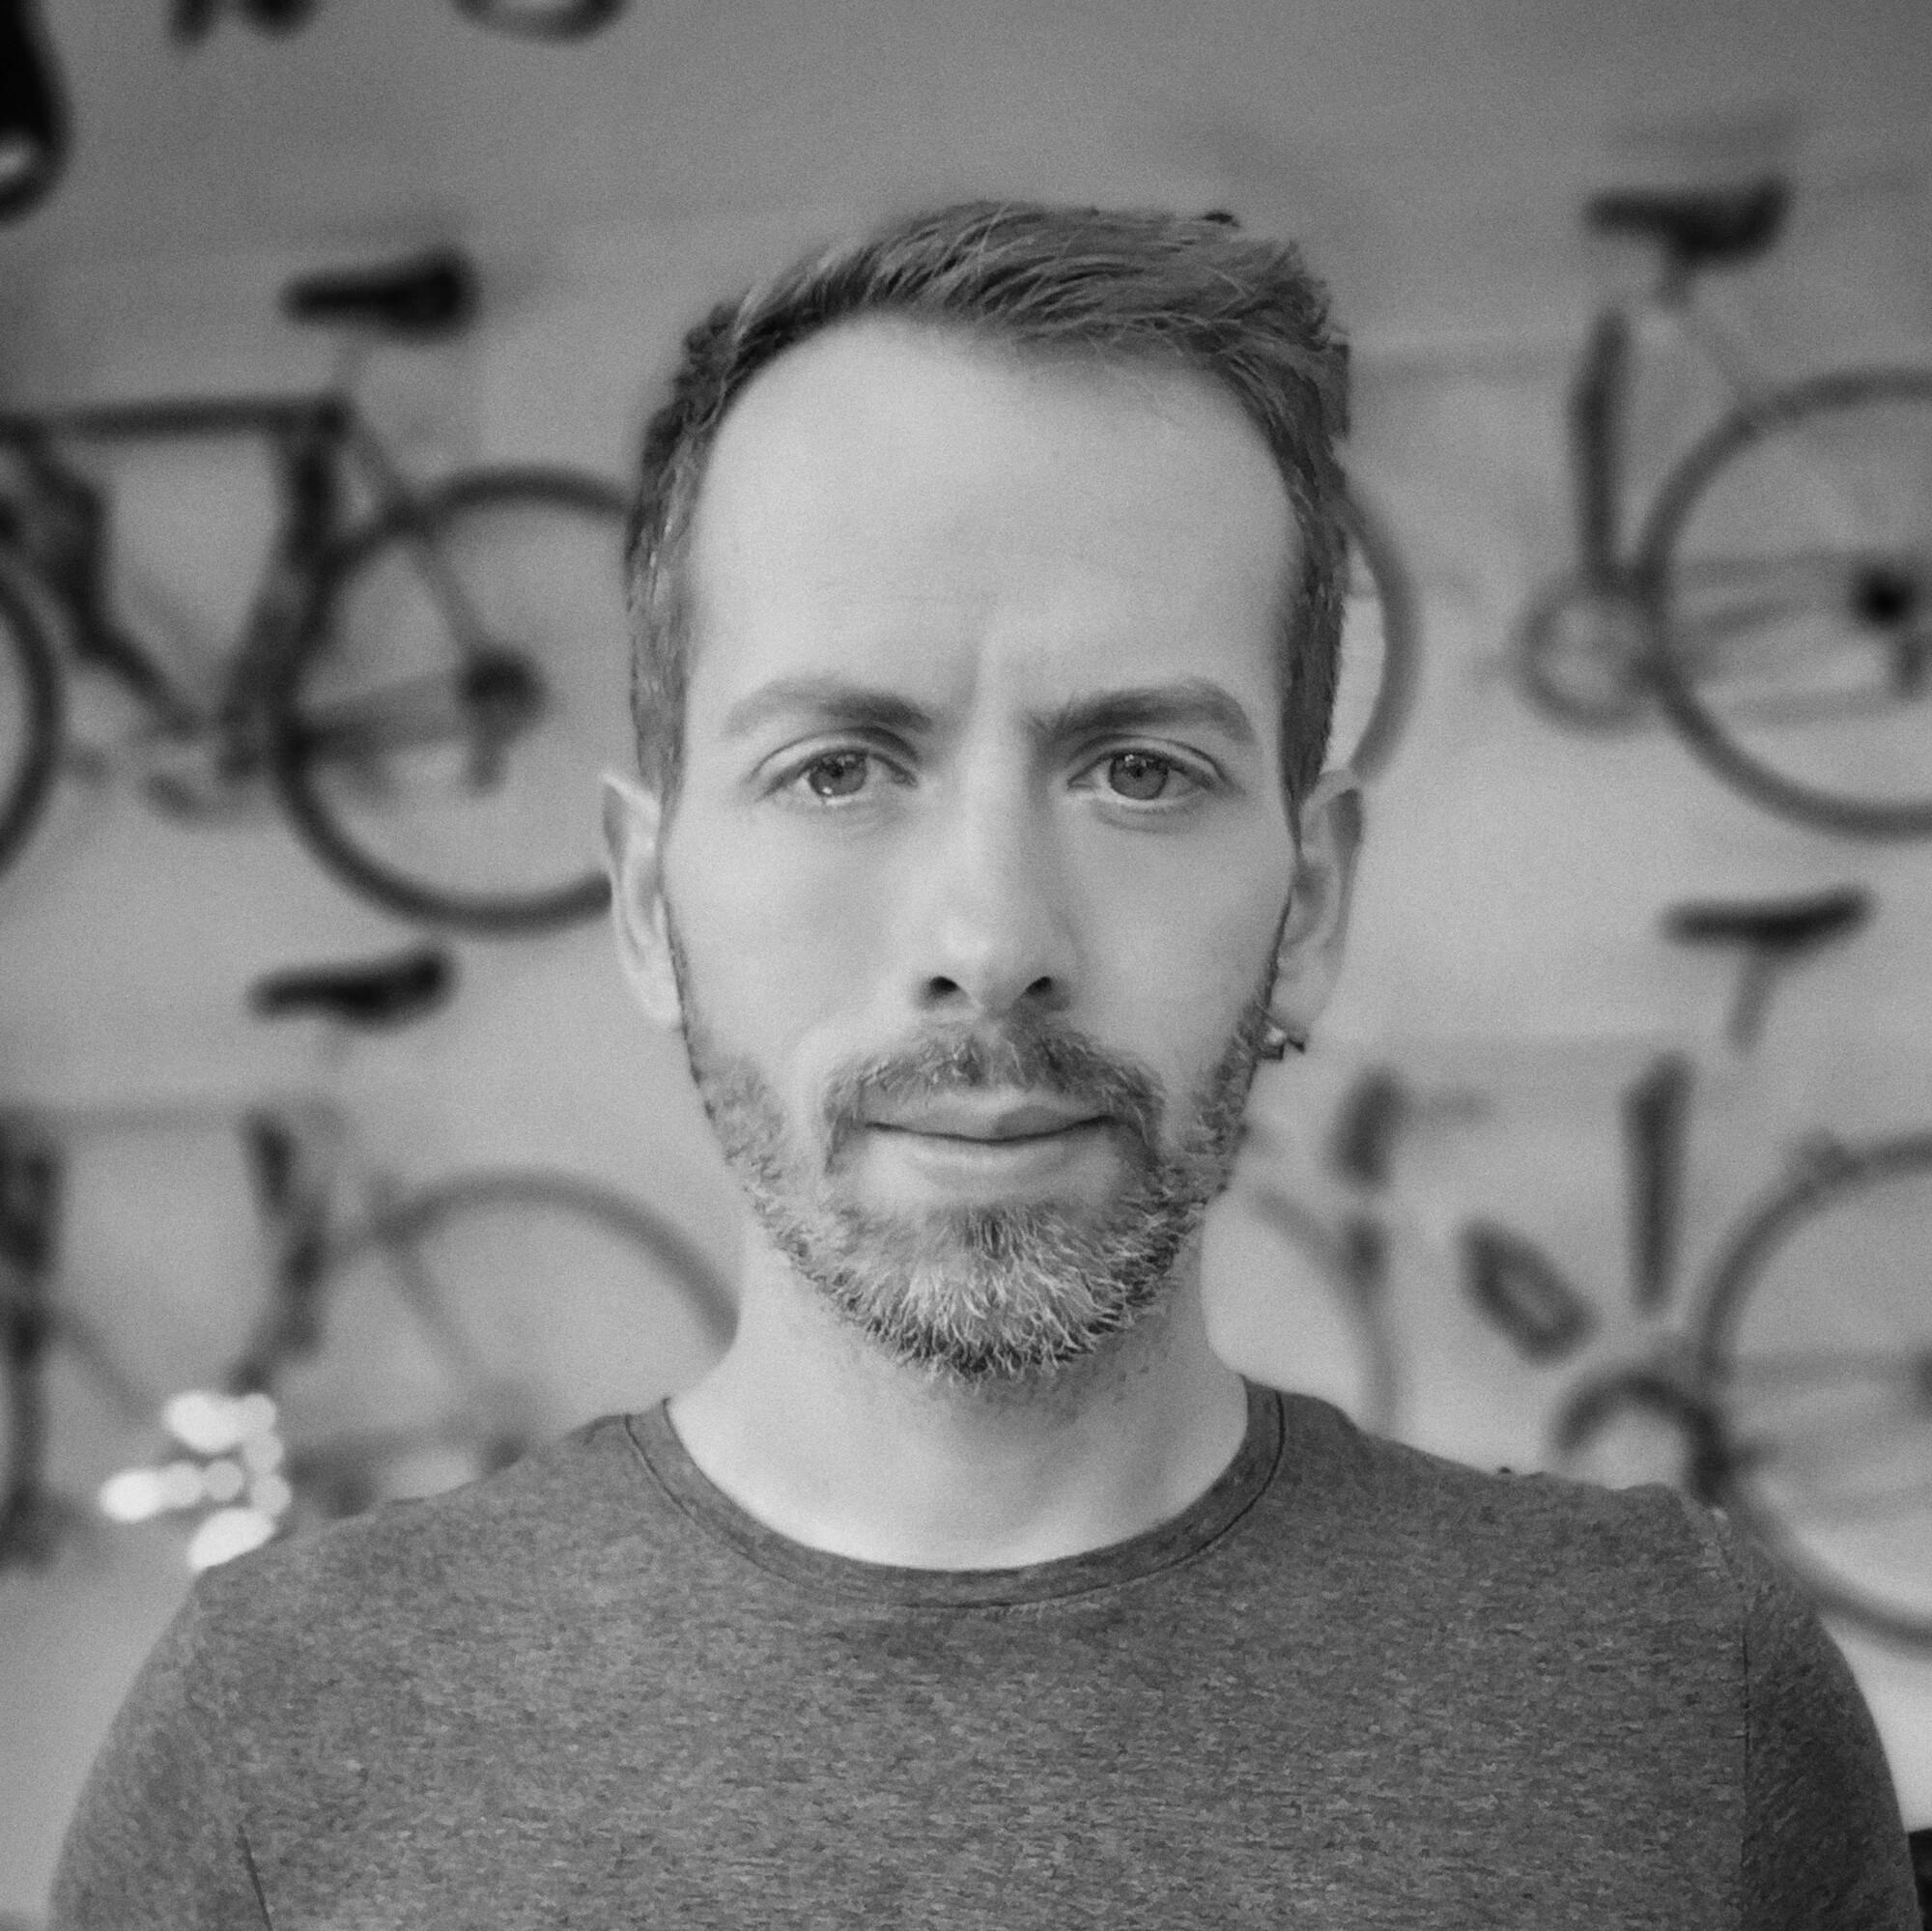 Kurzinterview mit dem «Dead Ends & Cake» Veranstalter Dominik Bokstaller